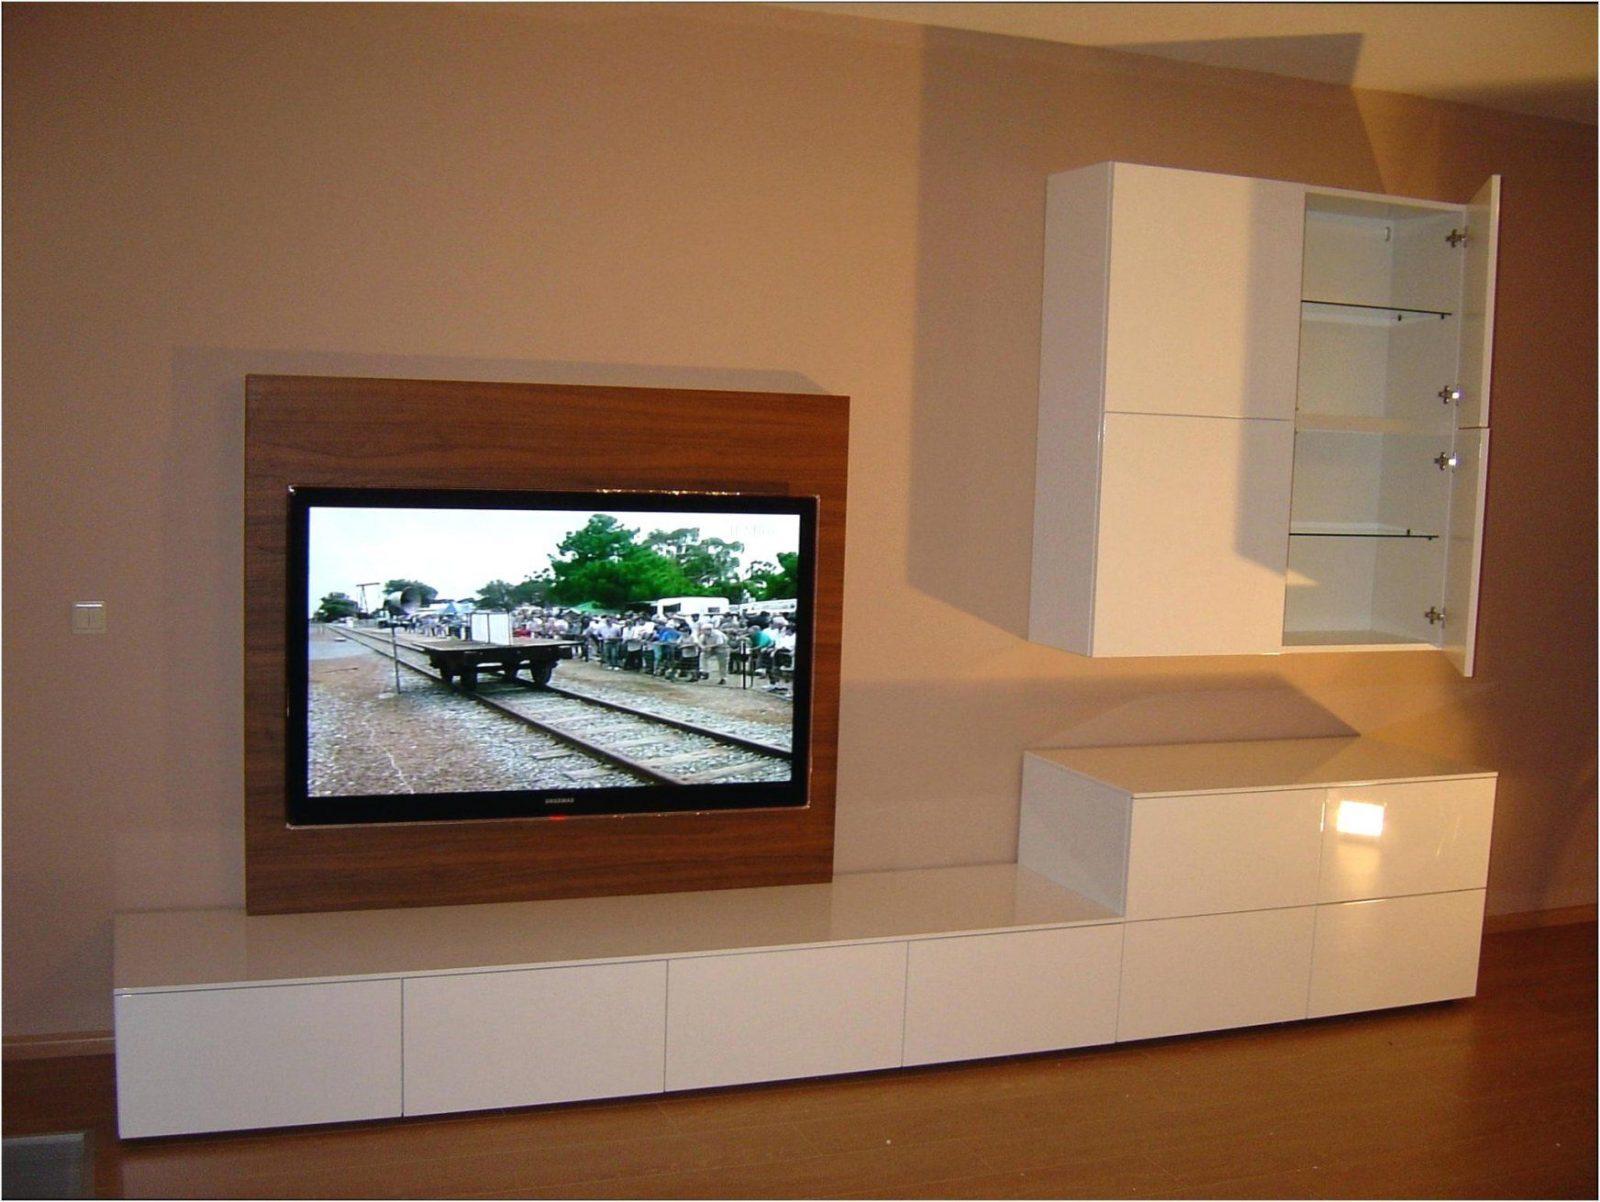 wohnwand selber bauen rigips mit tv wand bauanleitung zum heimwerker